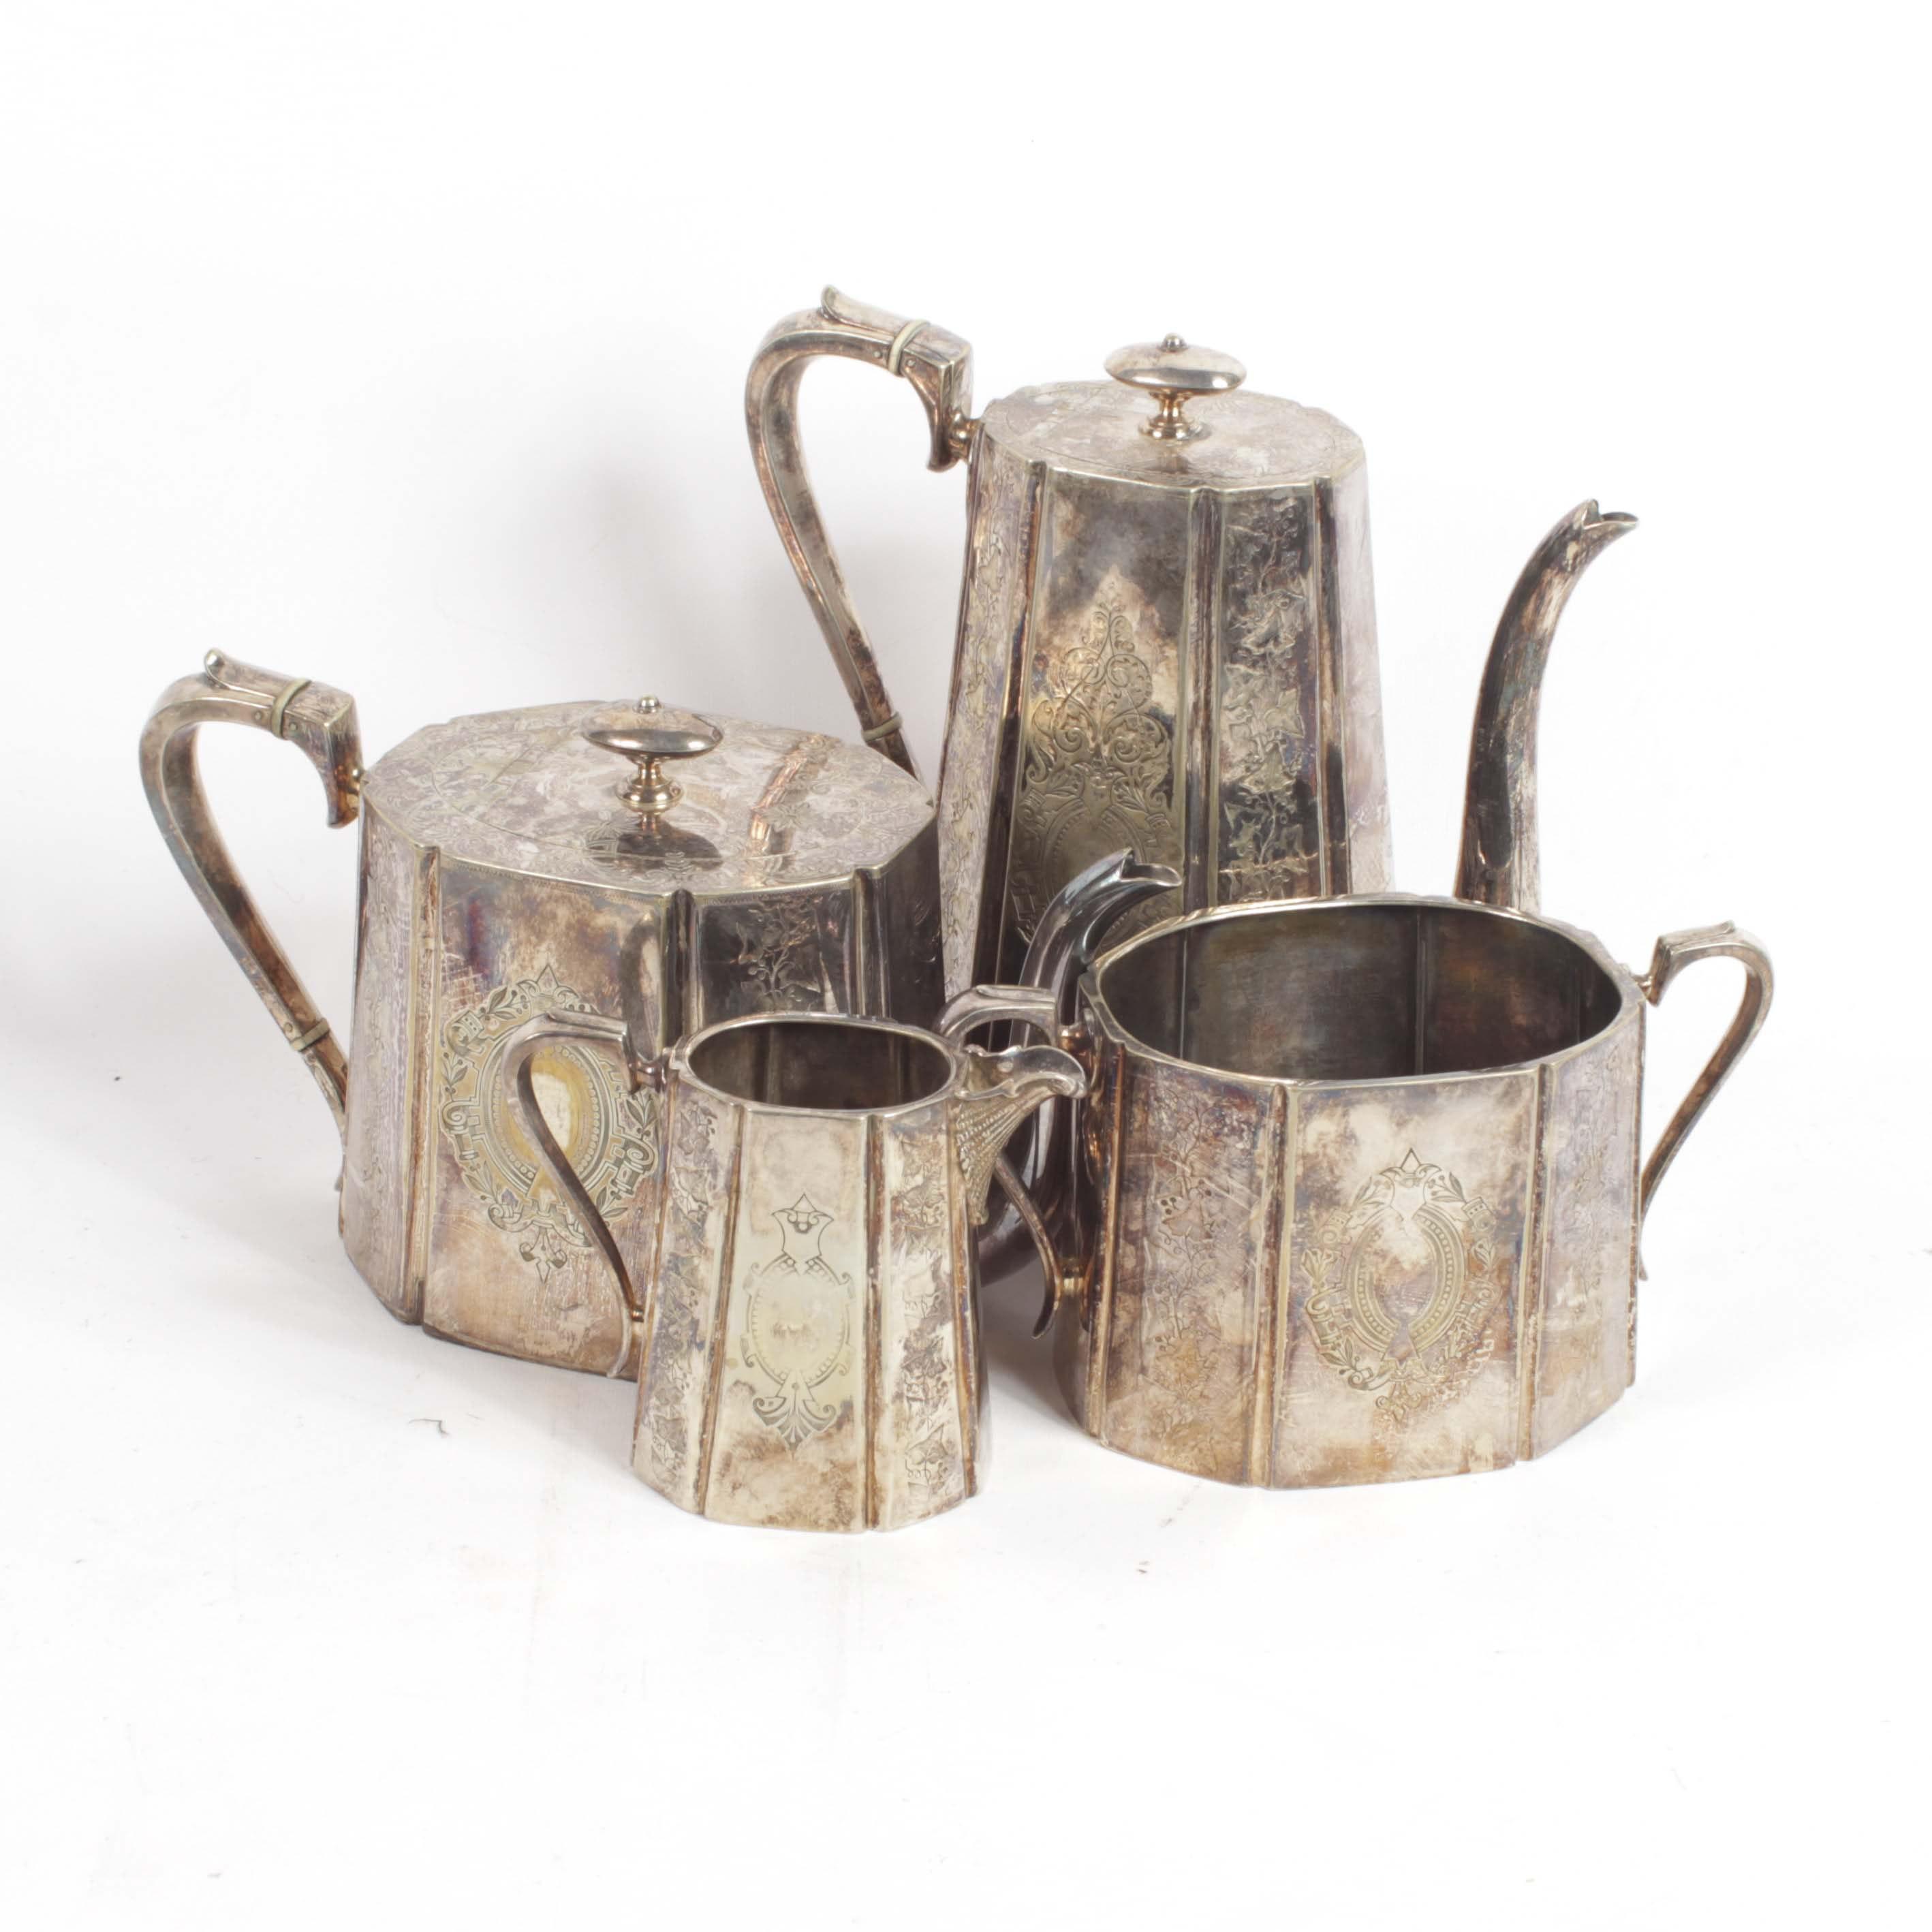 English Silver Plate Silver Tea and Coffee Service, Circa 1900